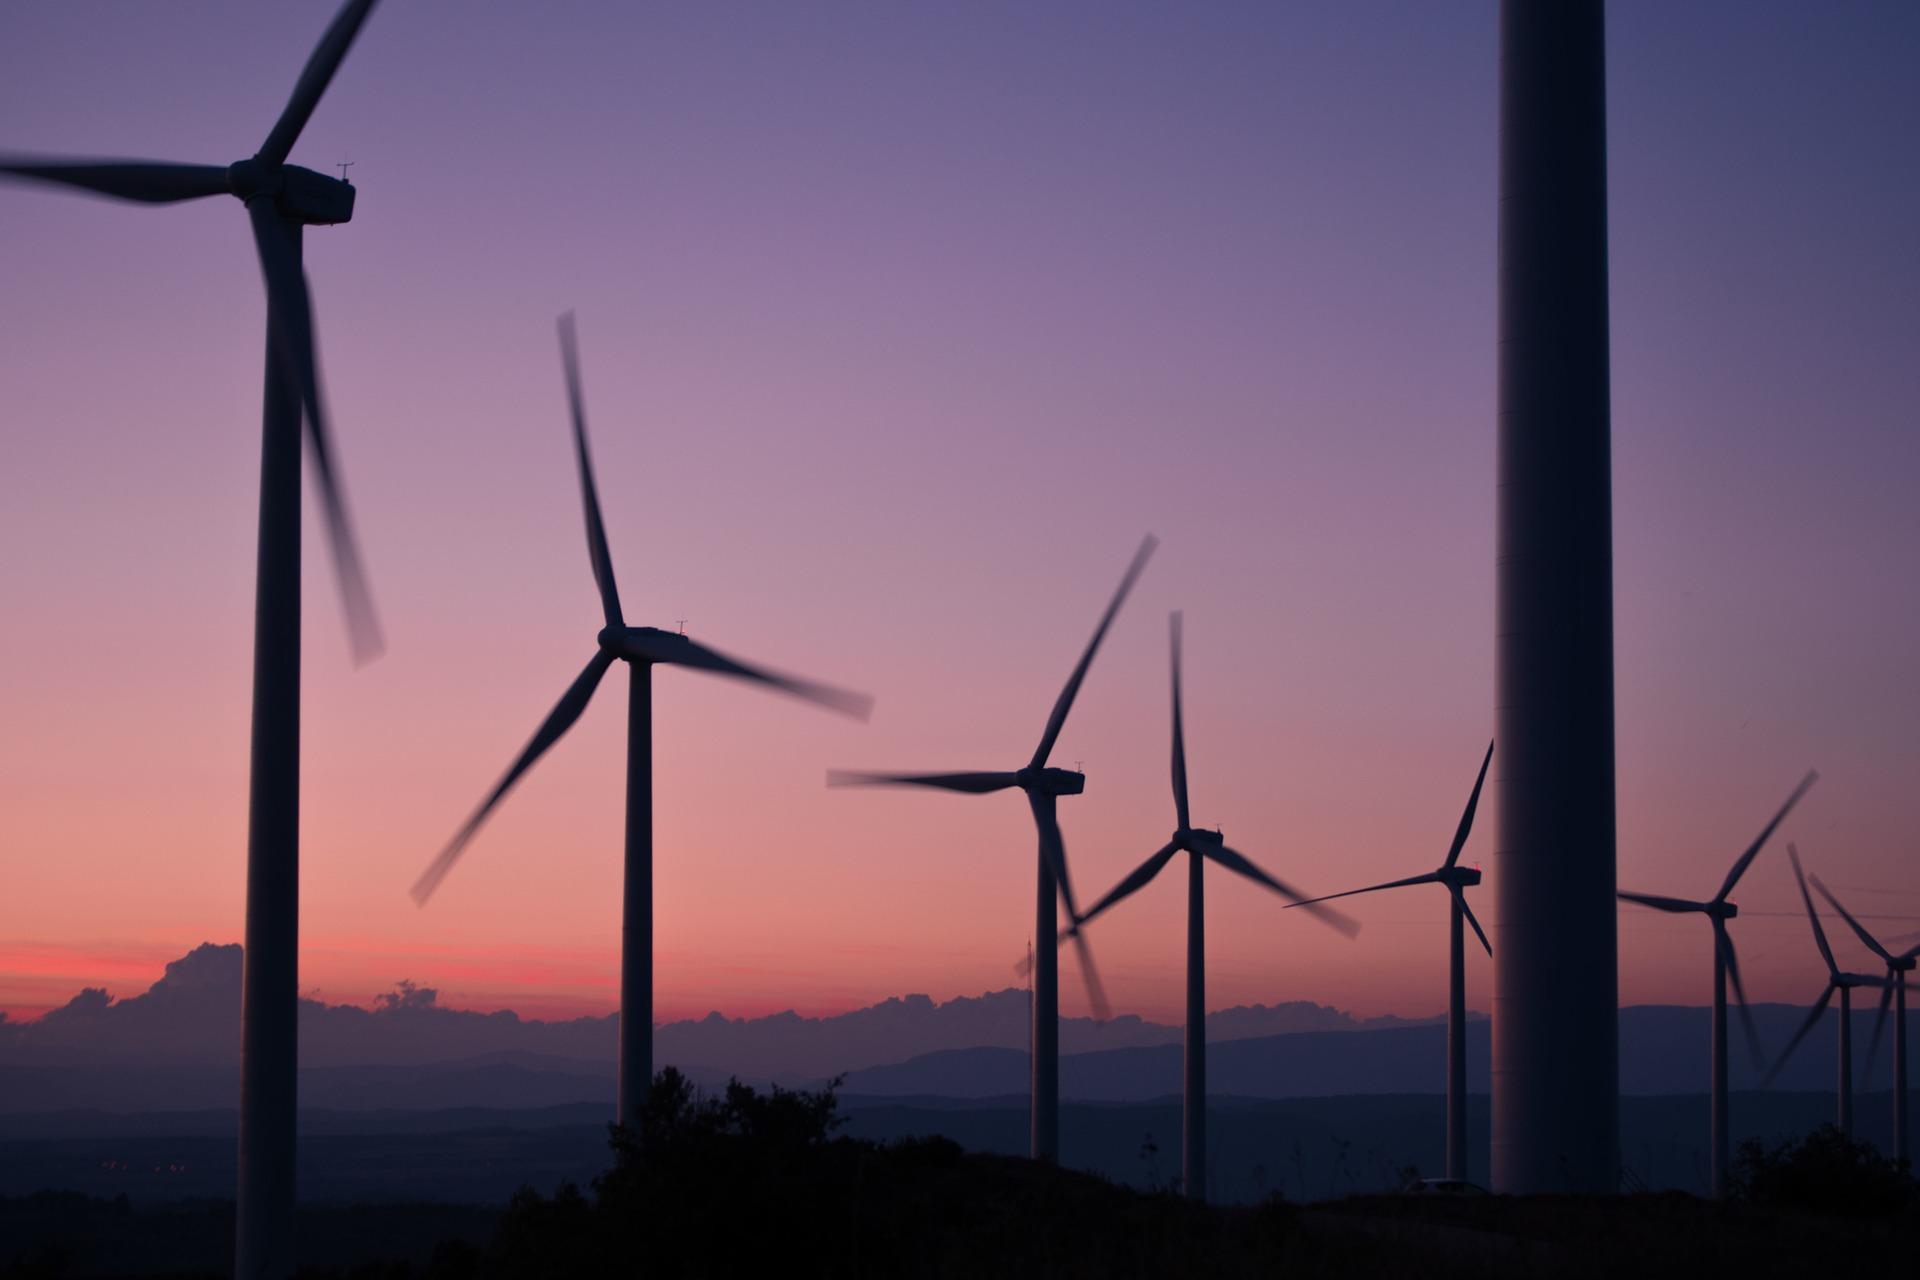 wind farm with a purple and orange sunset